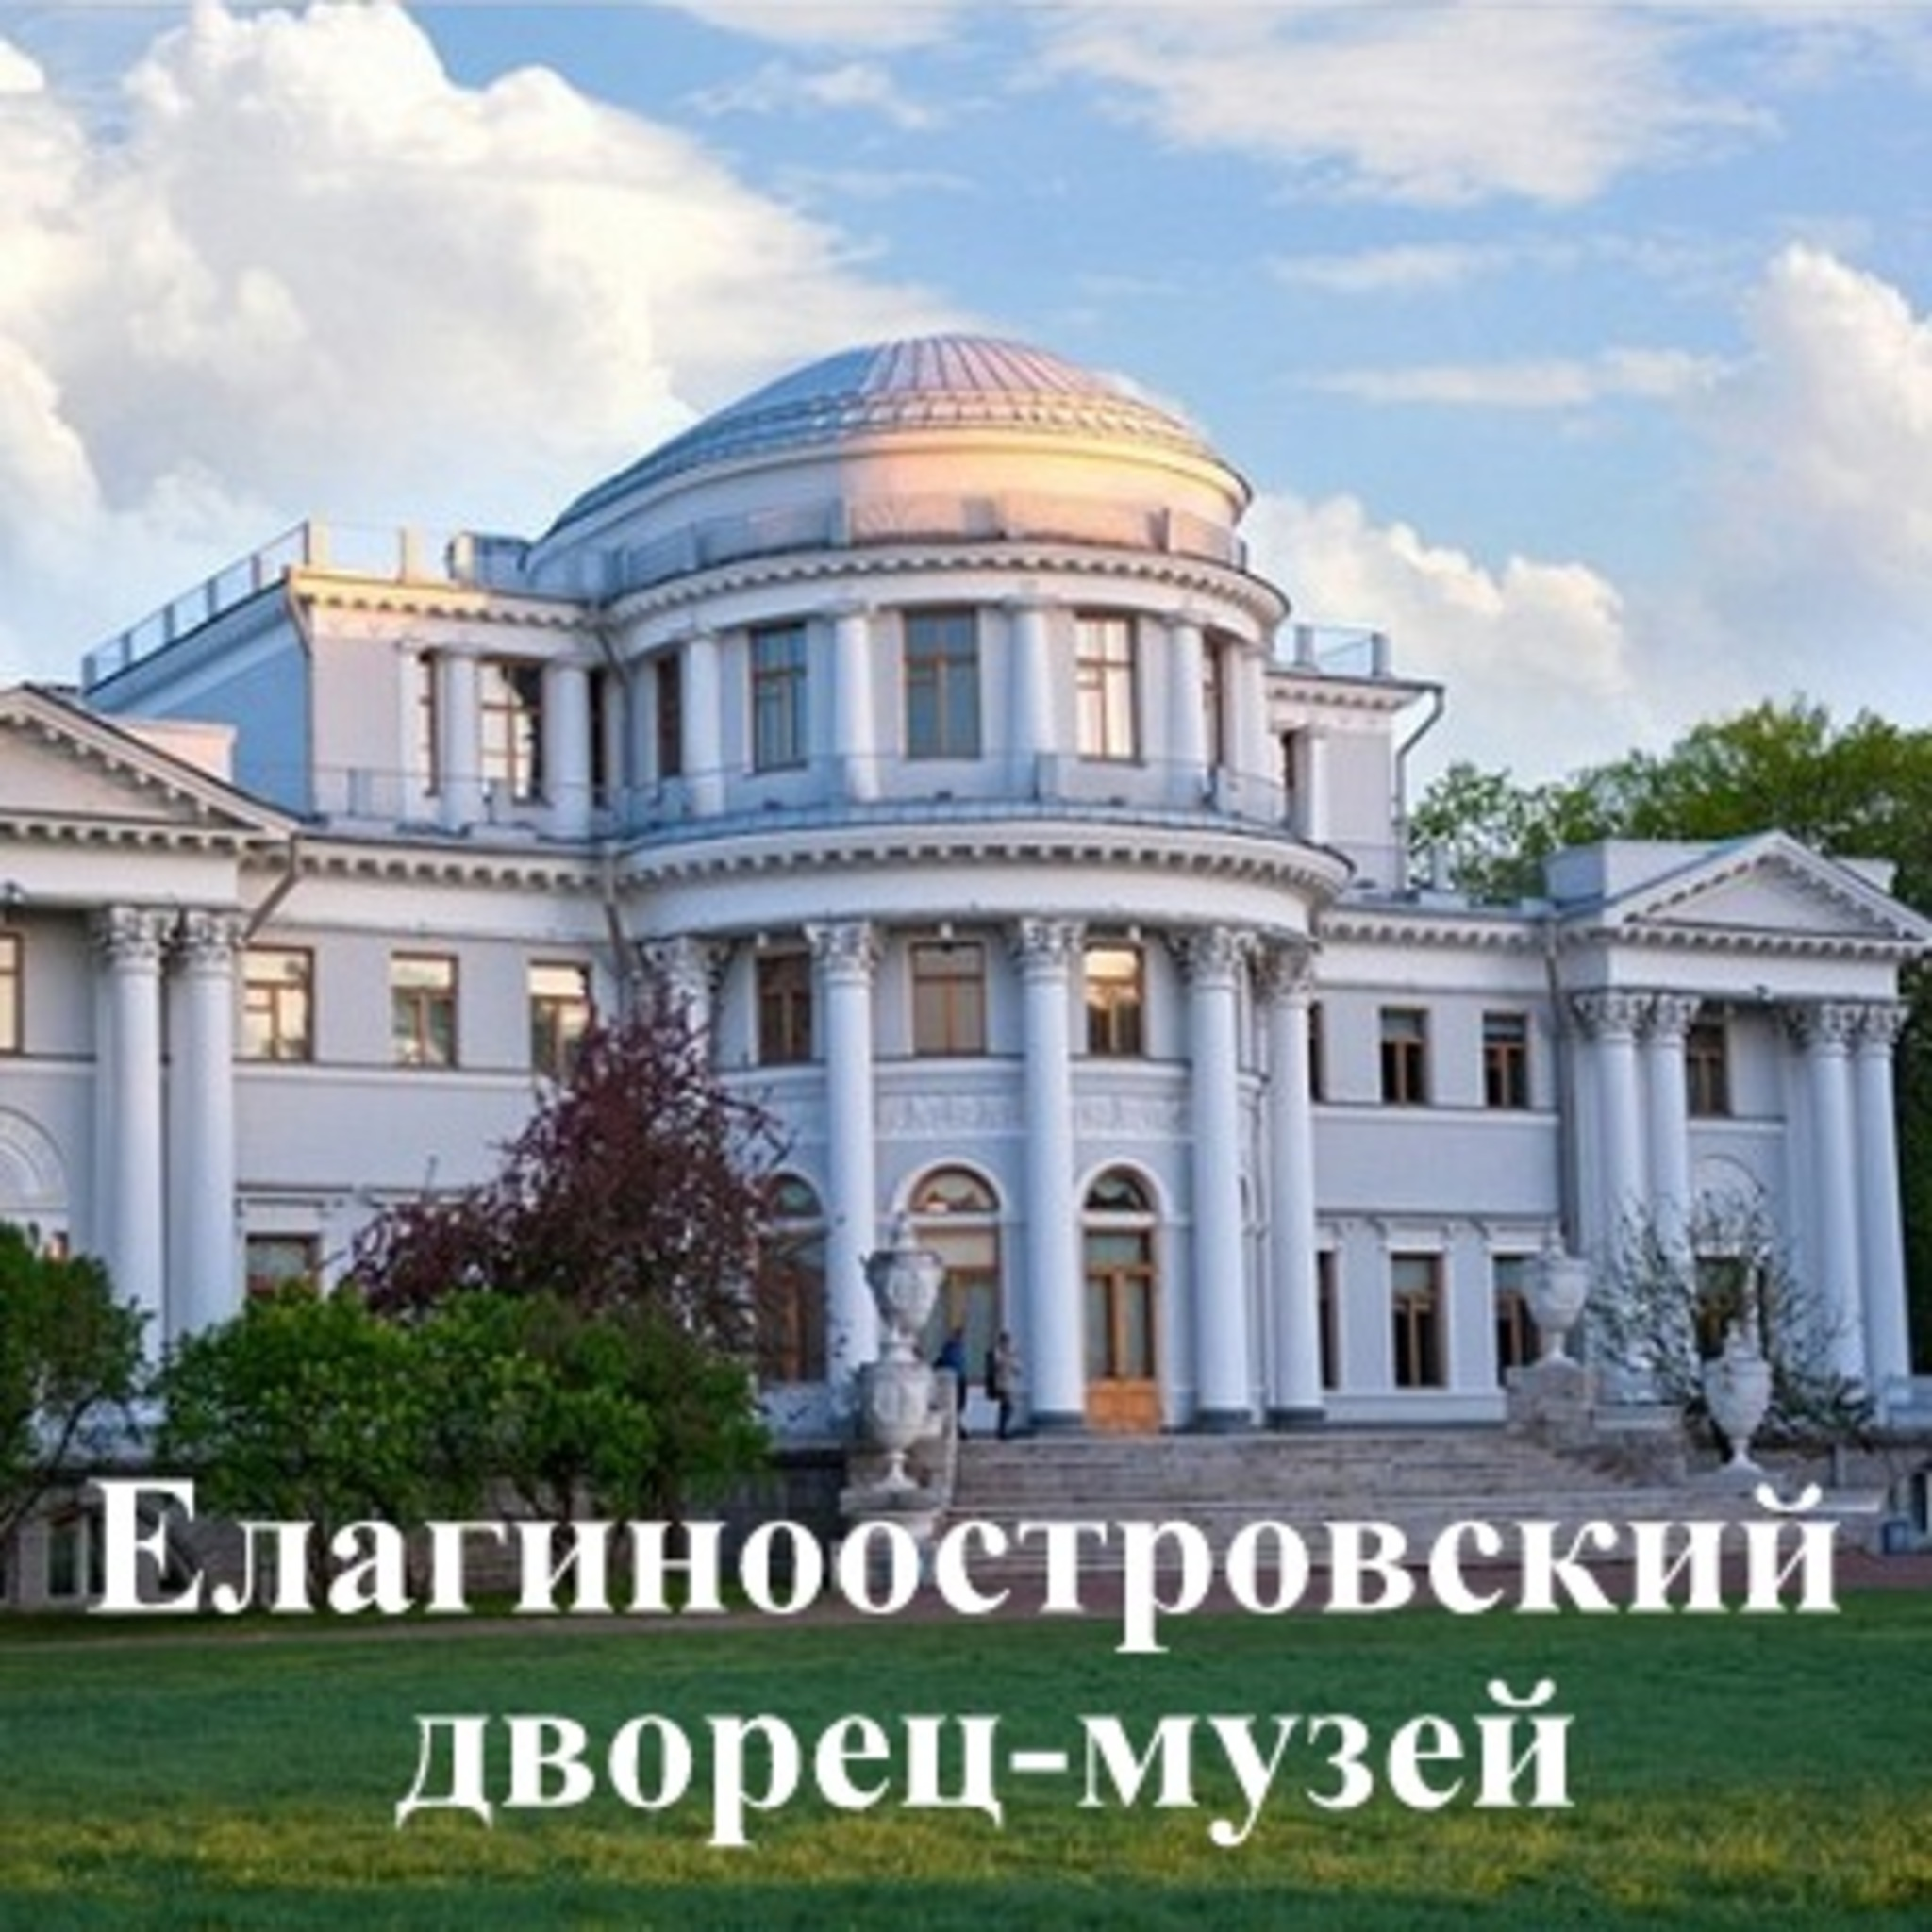 Elaginoostrovsky Palace-Museum